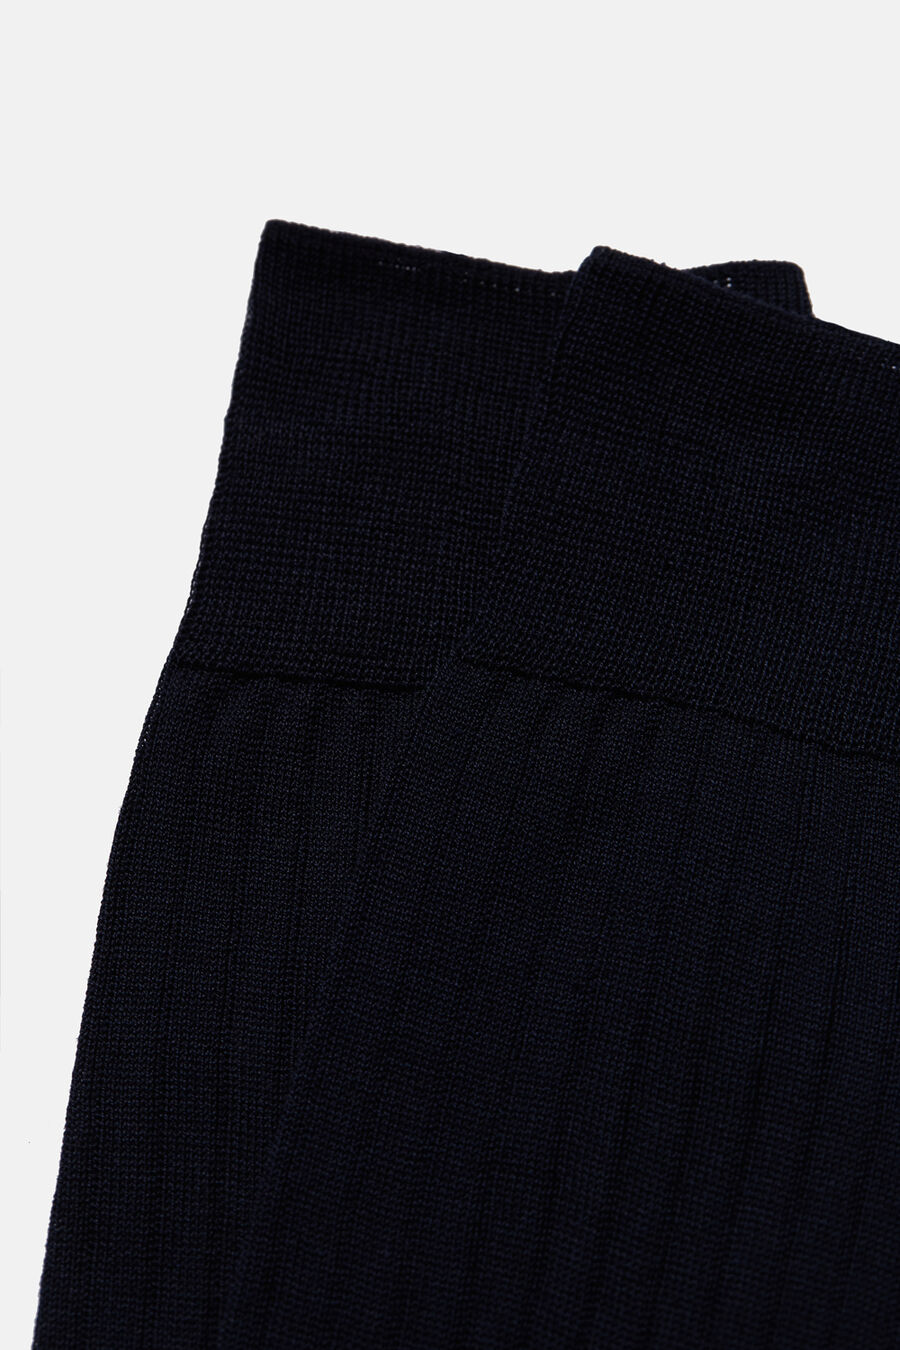 Pack of 2 pairs of tartan fabric socks